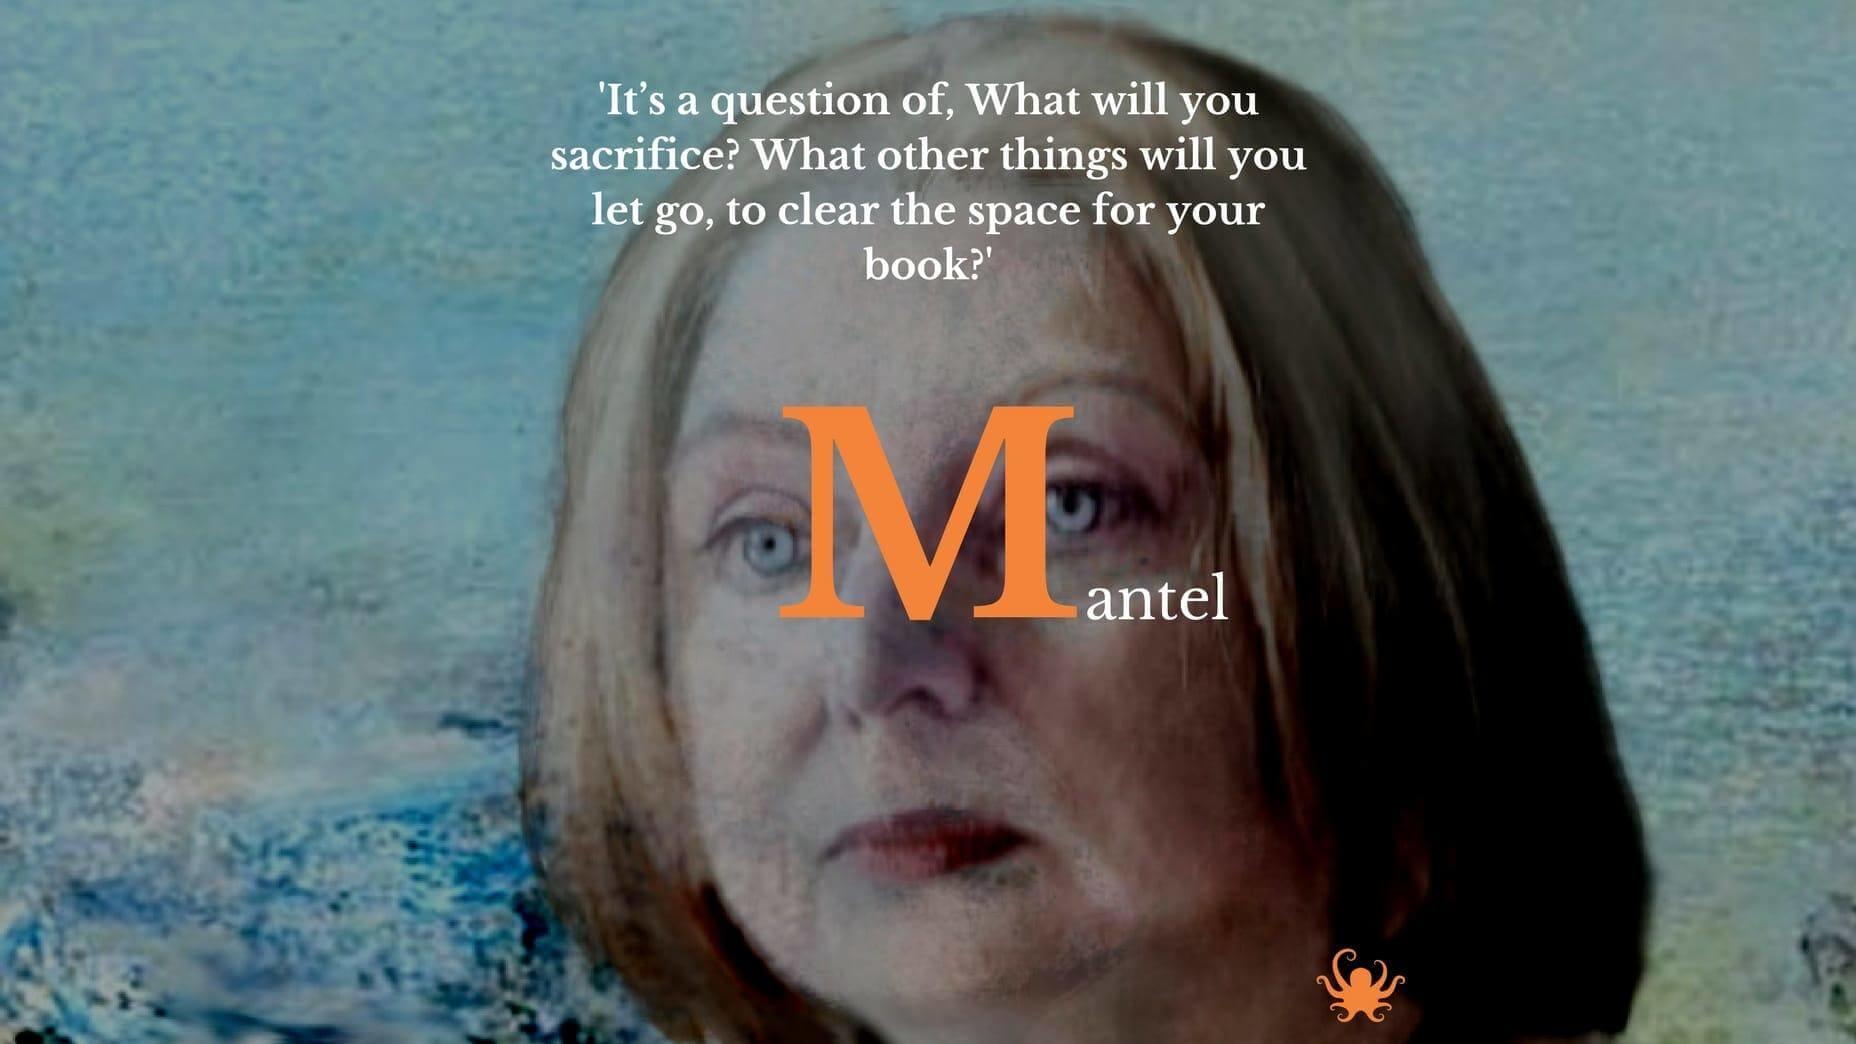 Hilary Mantel advice